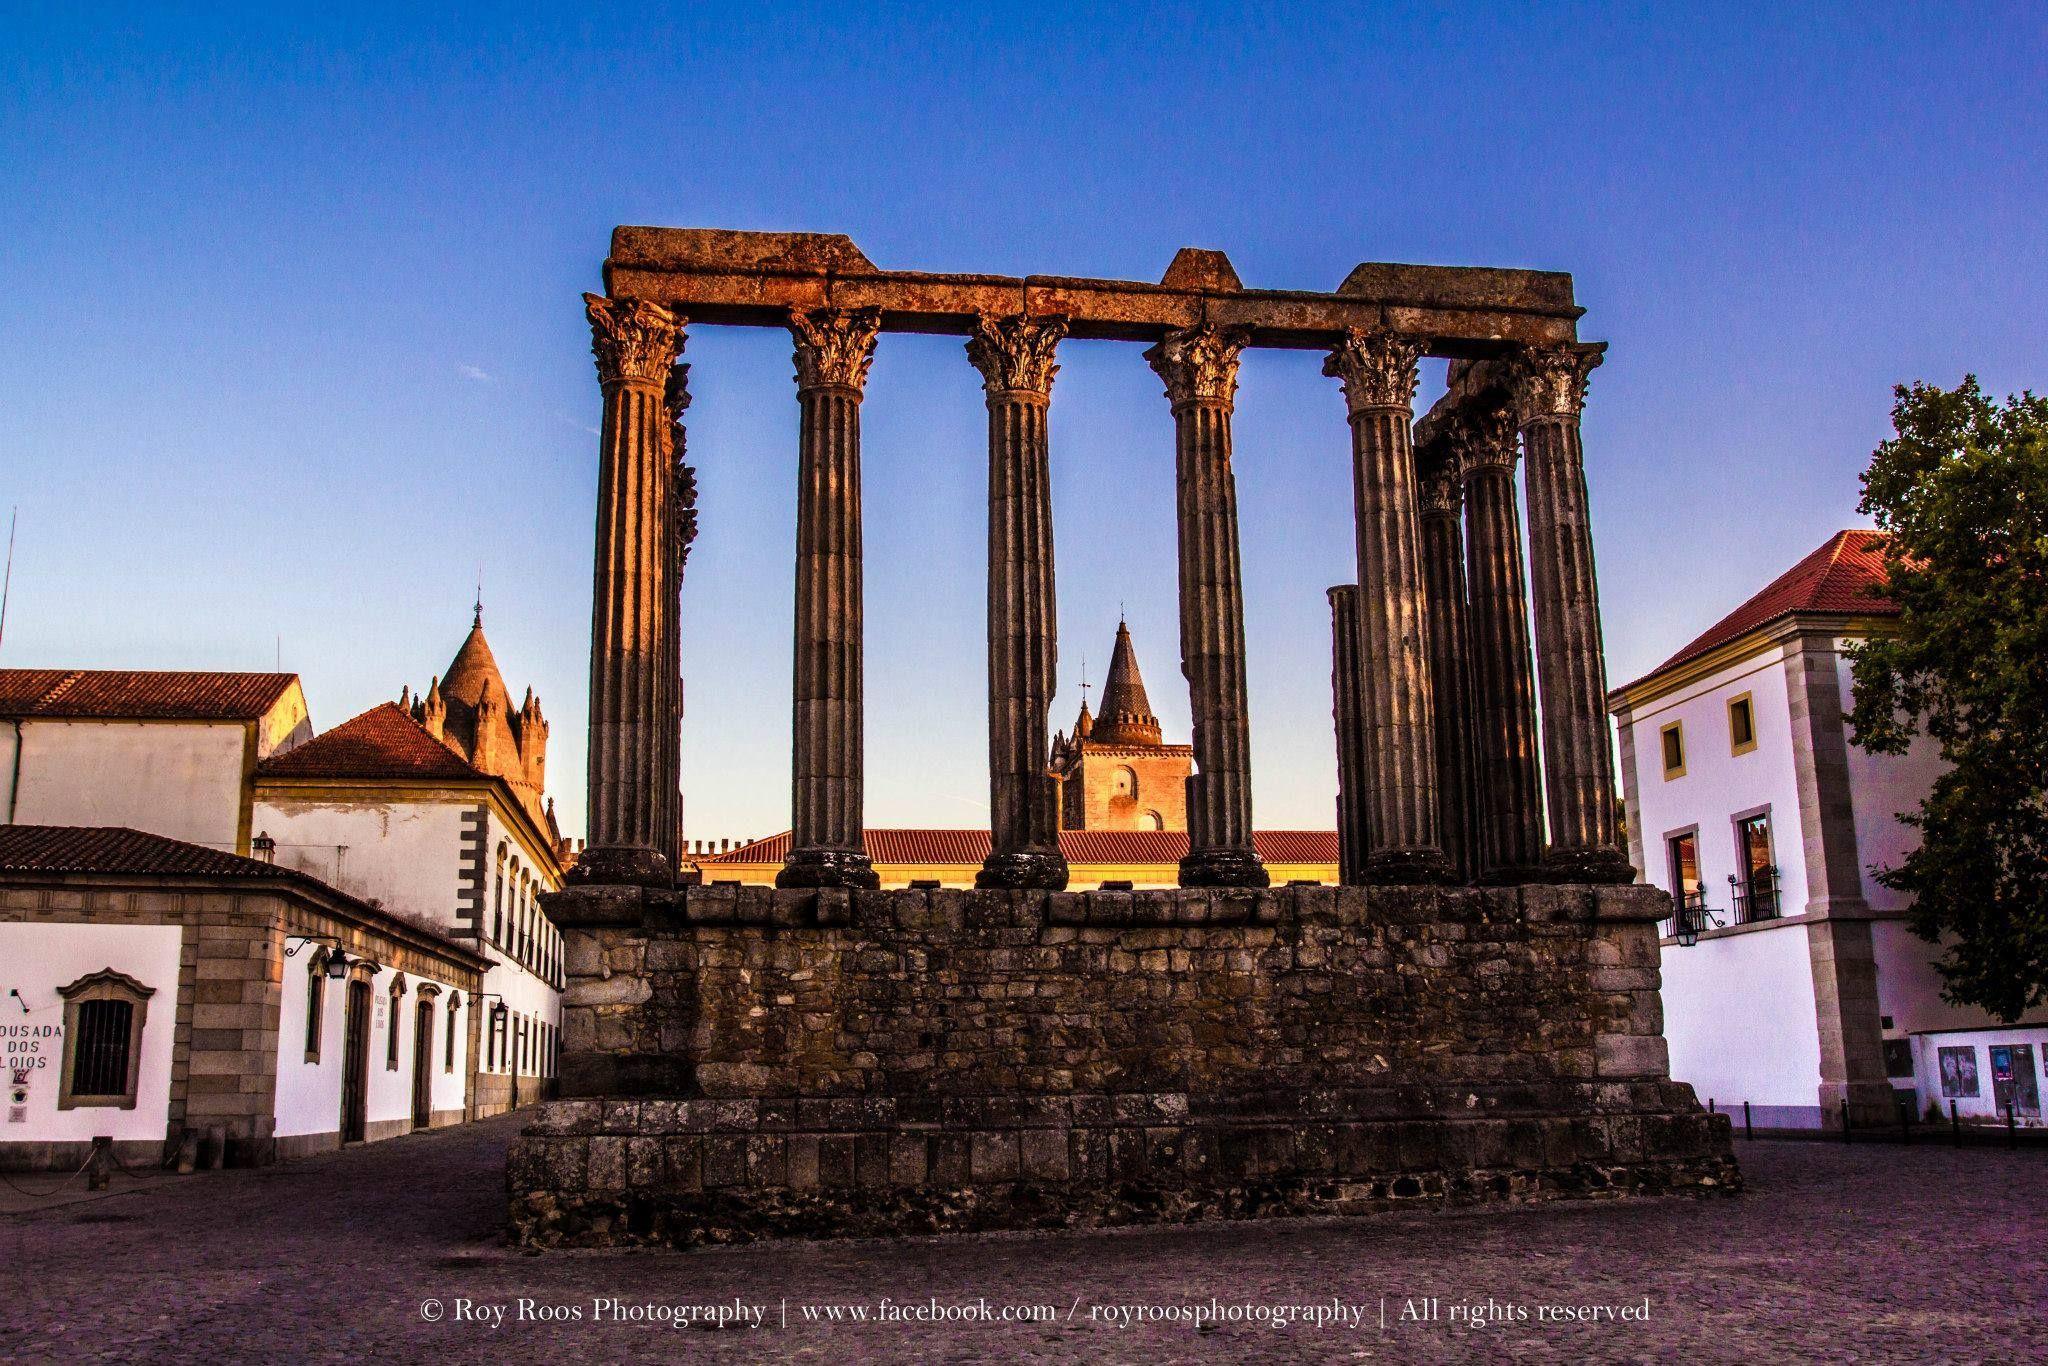 Templo Romano, Évora, Portugal - Roy Roos Photography  #Portugal# #gourmet# #Shoponline#